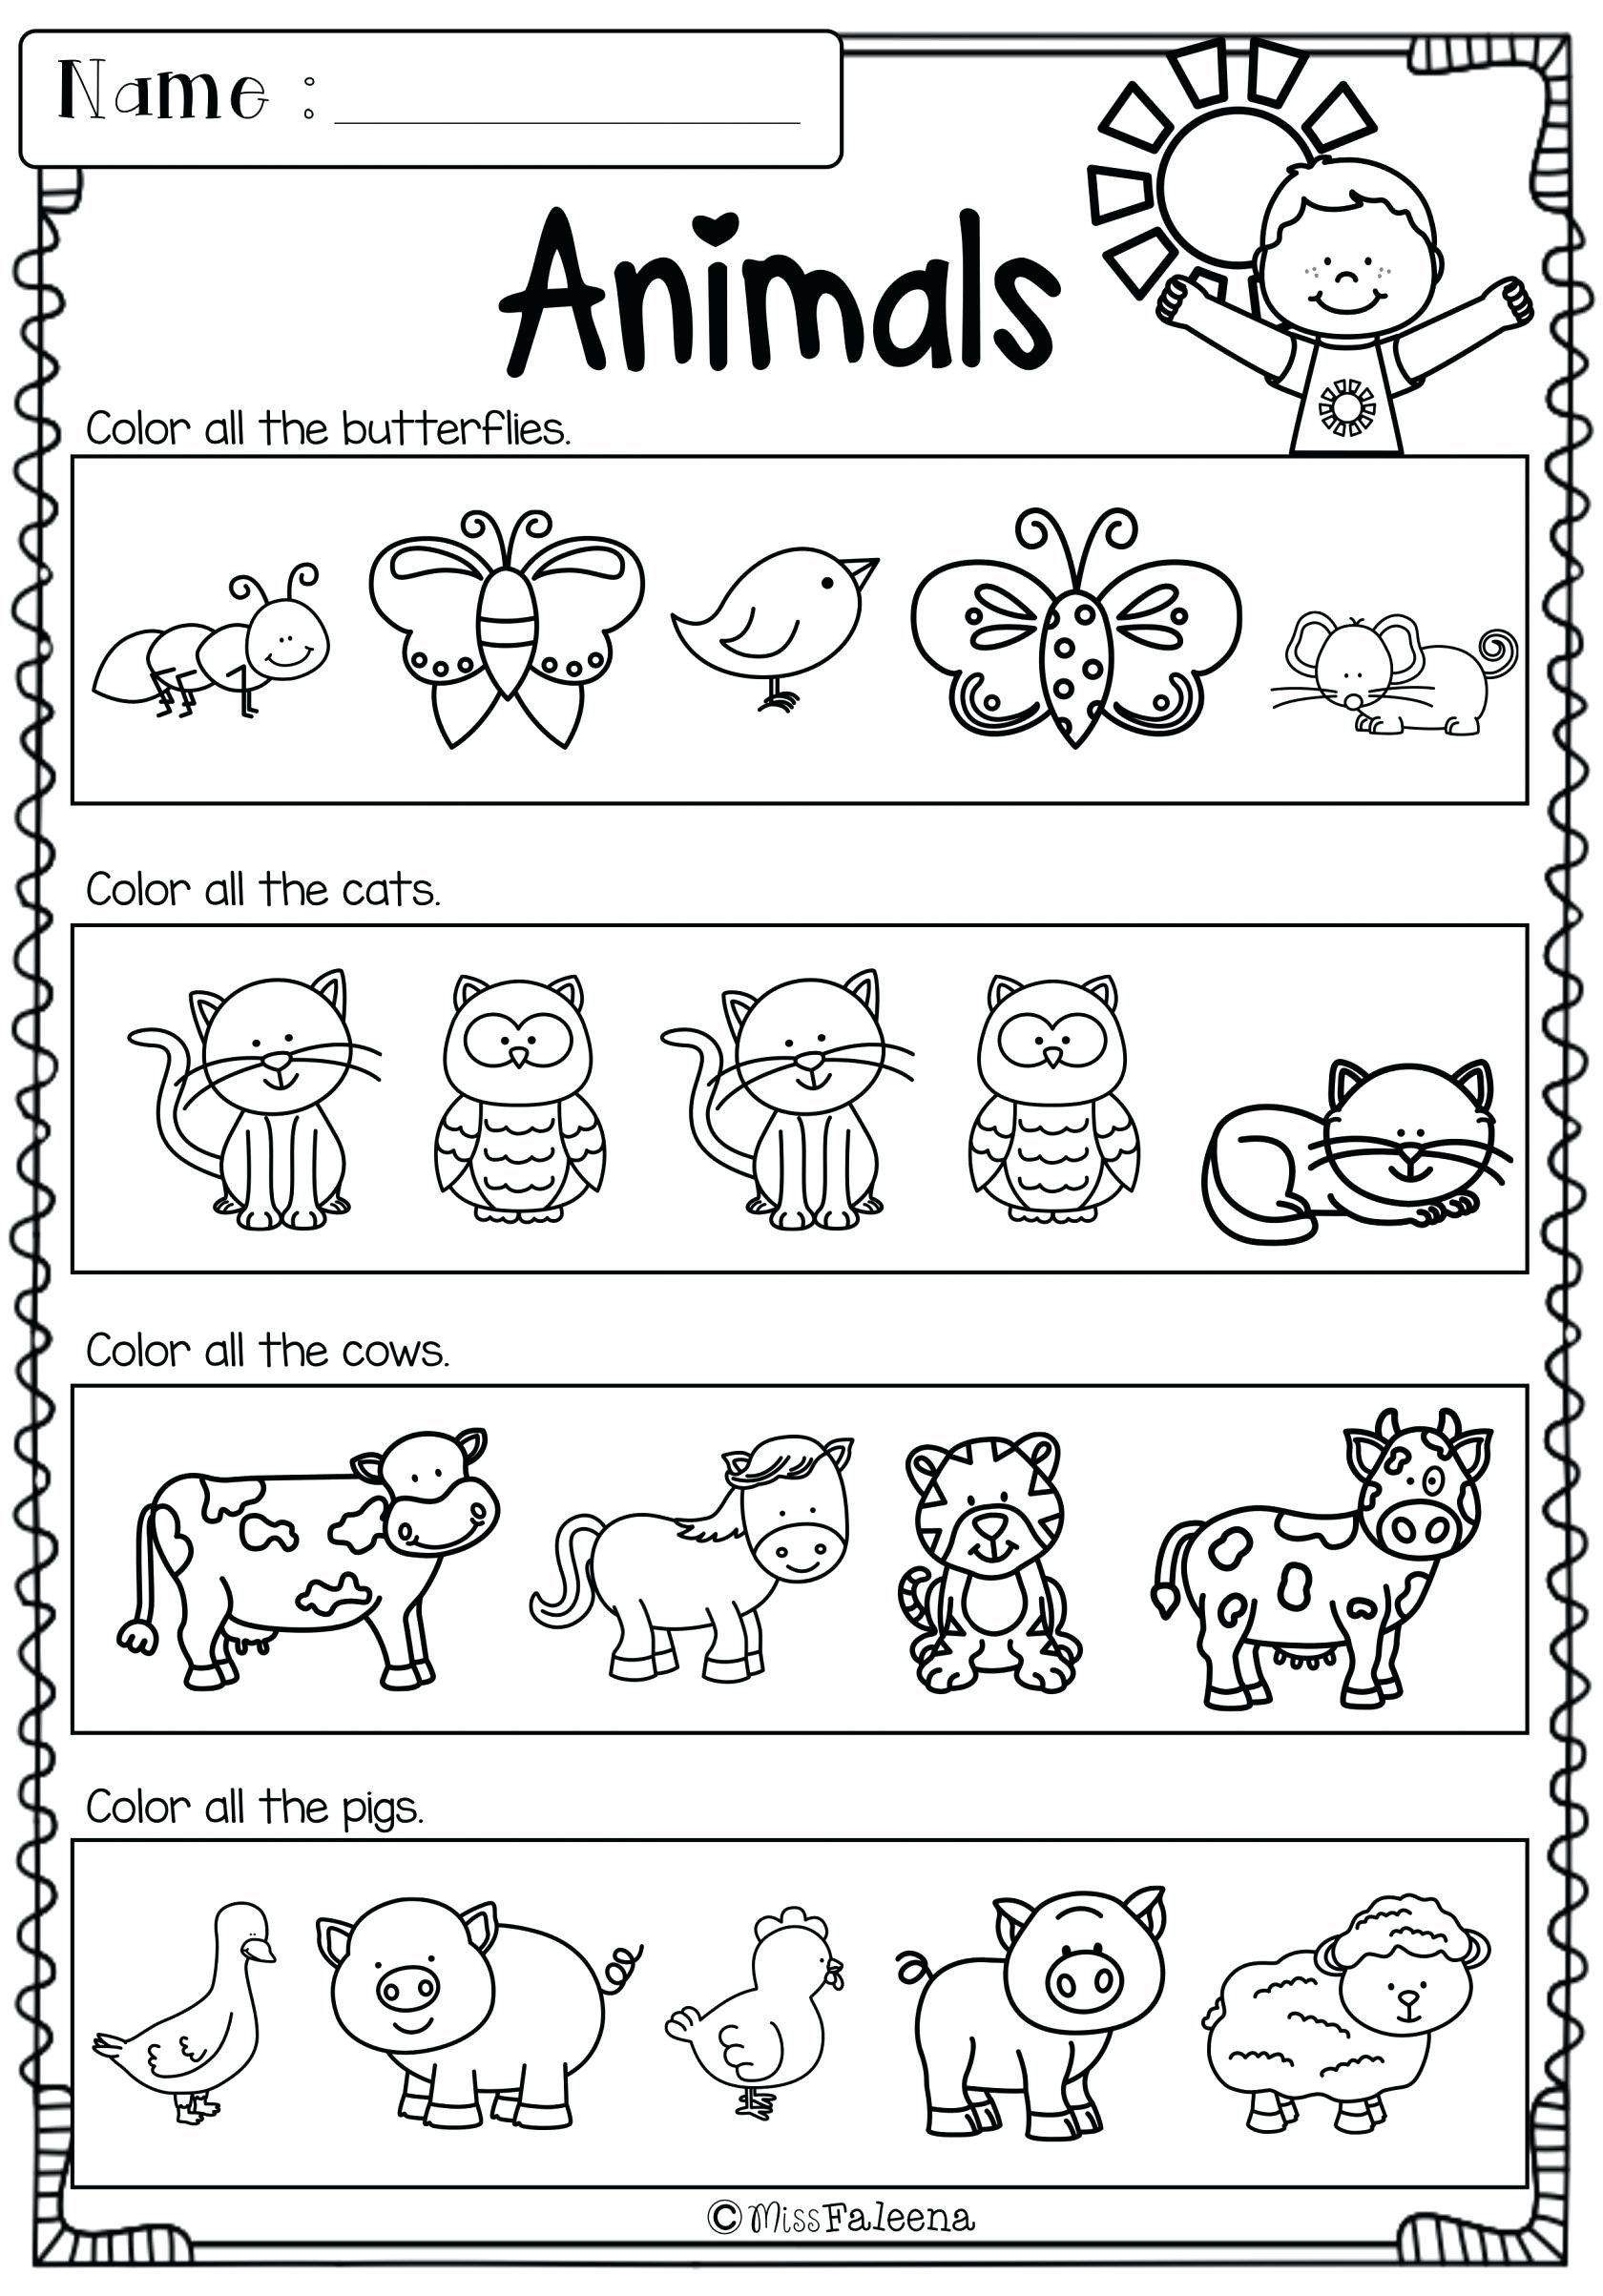 Syllables Worksheet For Kindergarten Syllables Worksheets For Kindergarten In 2020 Kindergarten Morning Work Kindergarten Worksheets Preschool Worksheets